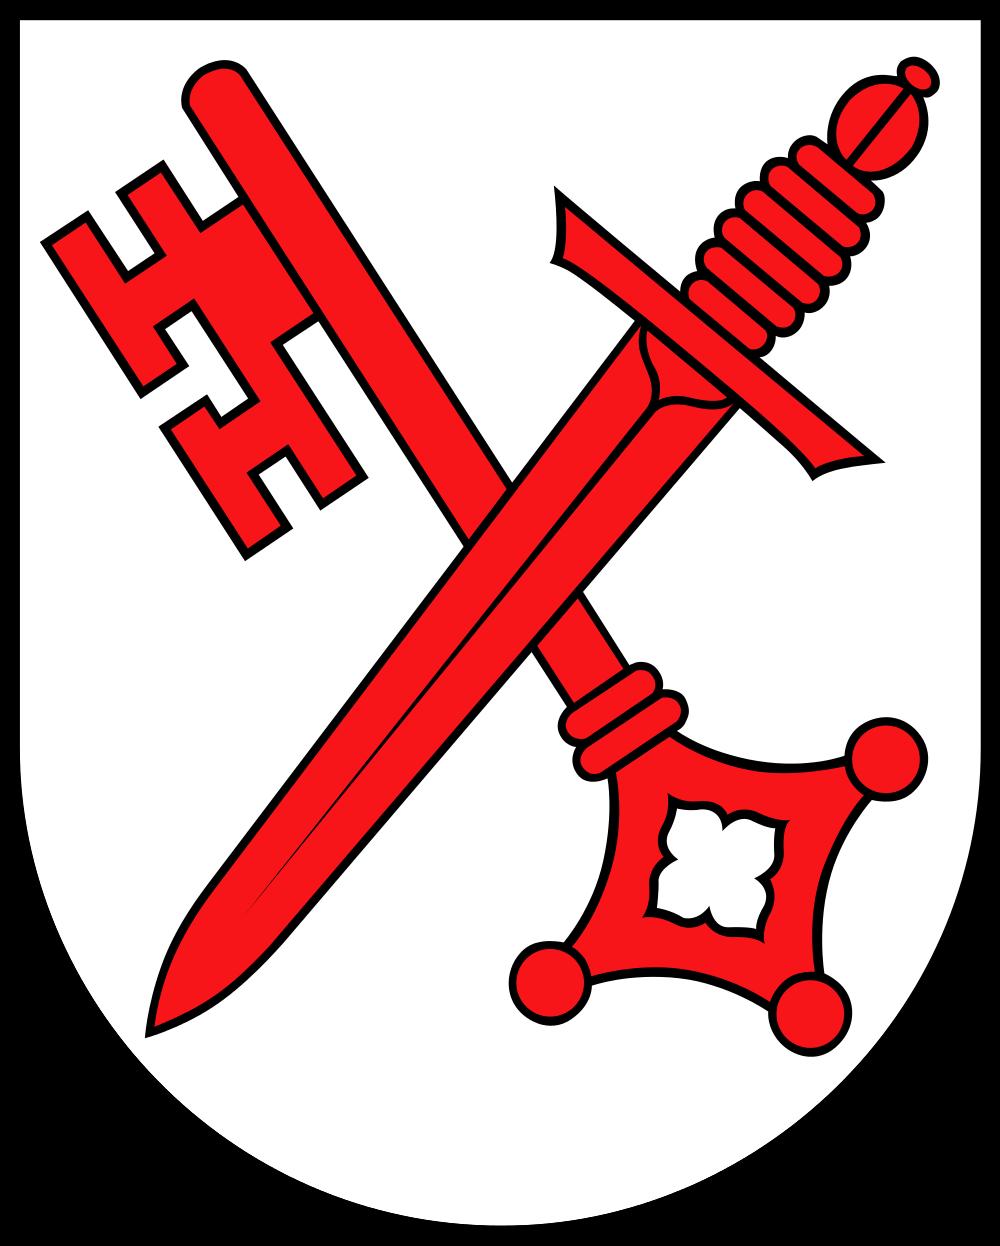 File:Wappen Naumburg (Saale).svg.